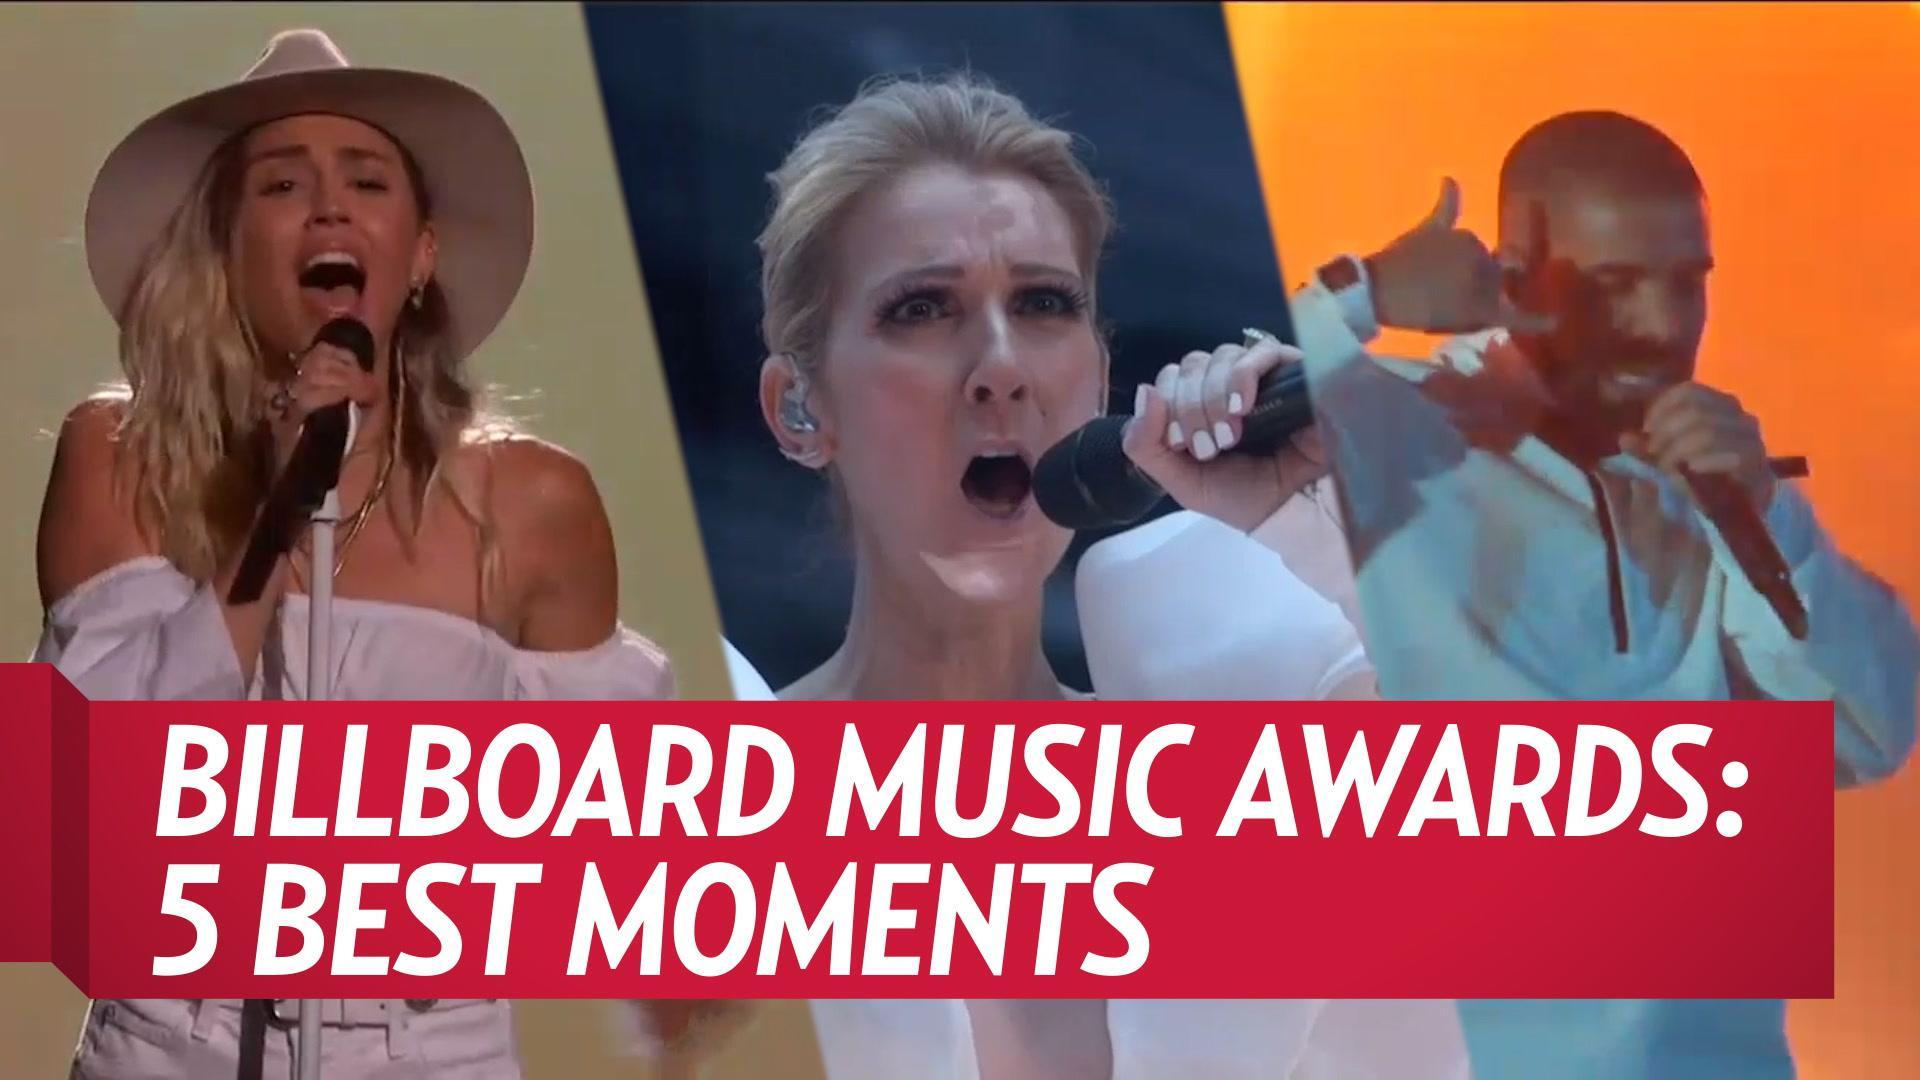 Billboard Music Awards 2017: 5 Best Moments